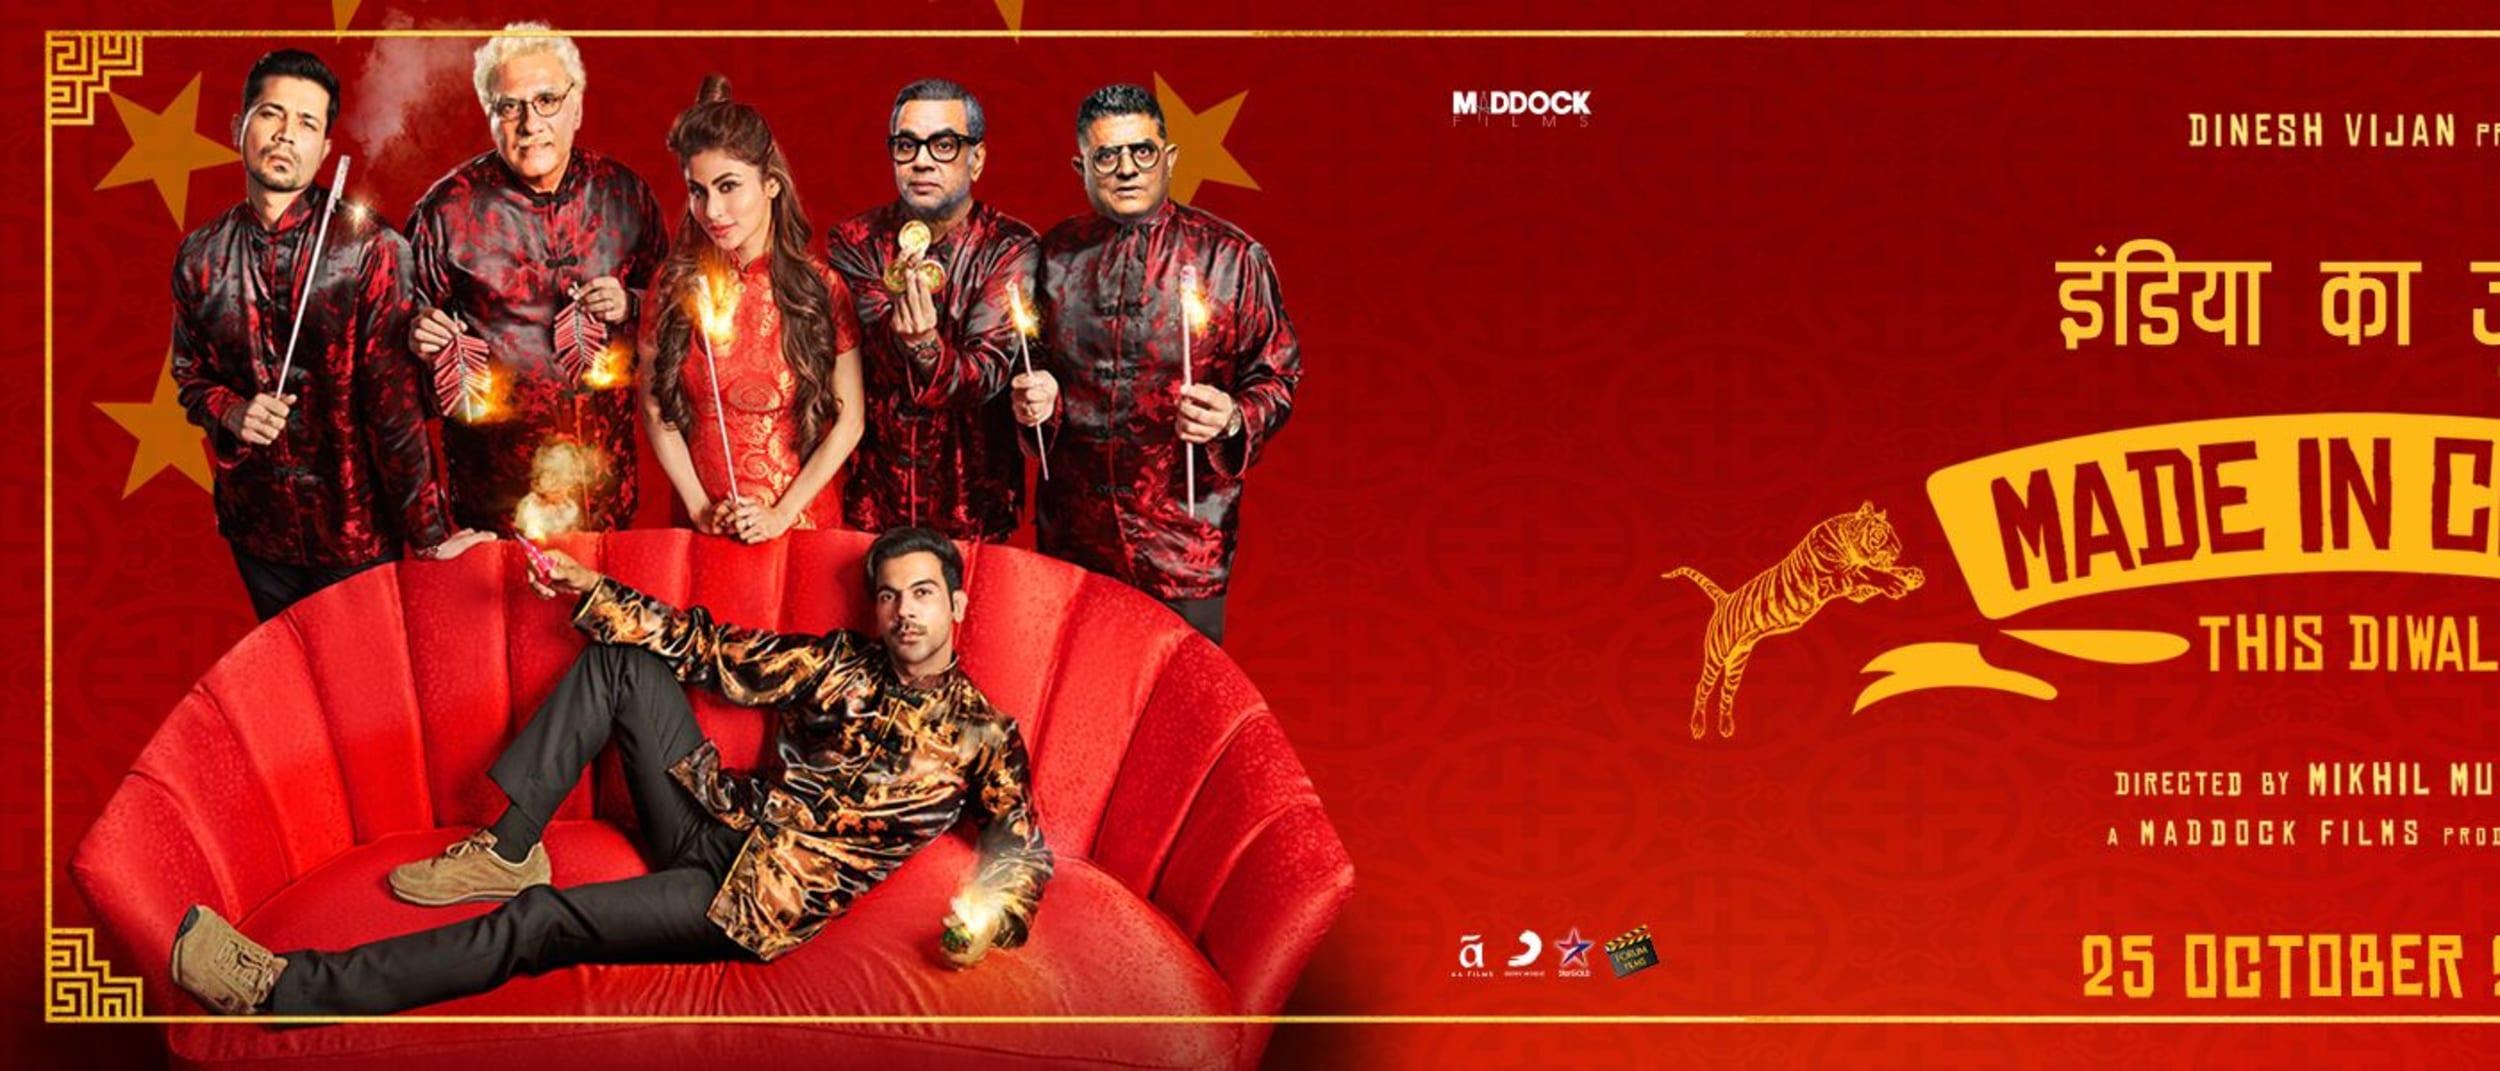 Diwali movie - Made in China